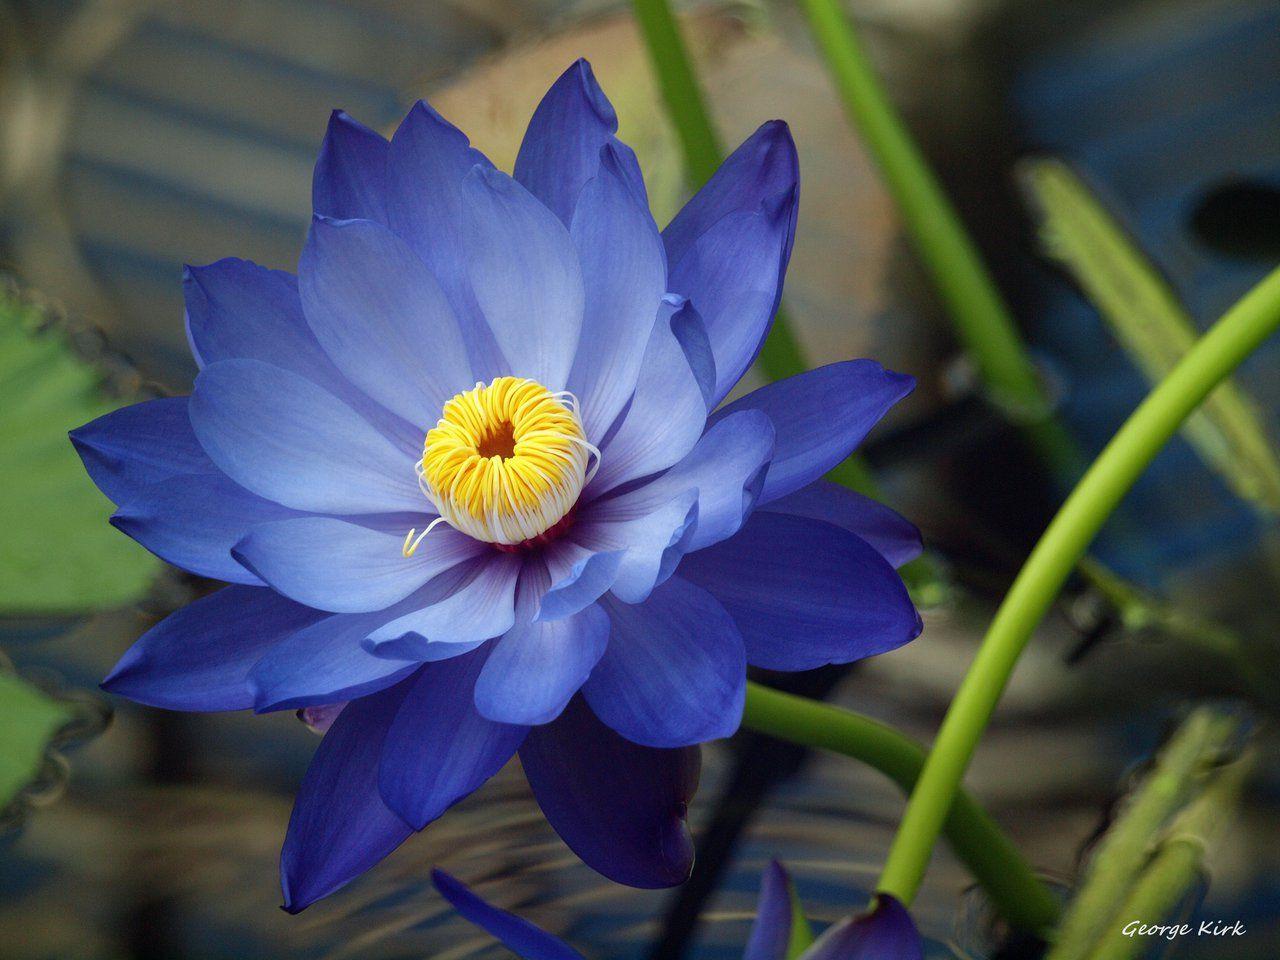 Norse nature spirit blue lotus by george kirk smell life norse nature spirit blue lotus by george kirk buycottarizona Choice Image